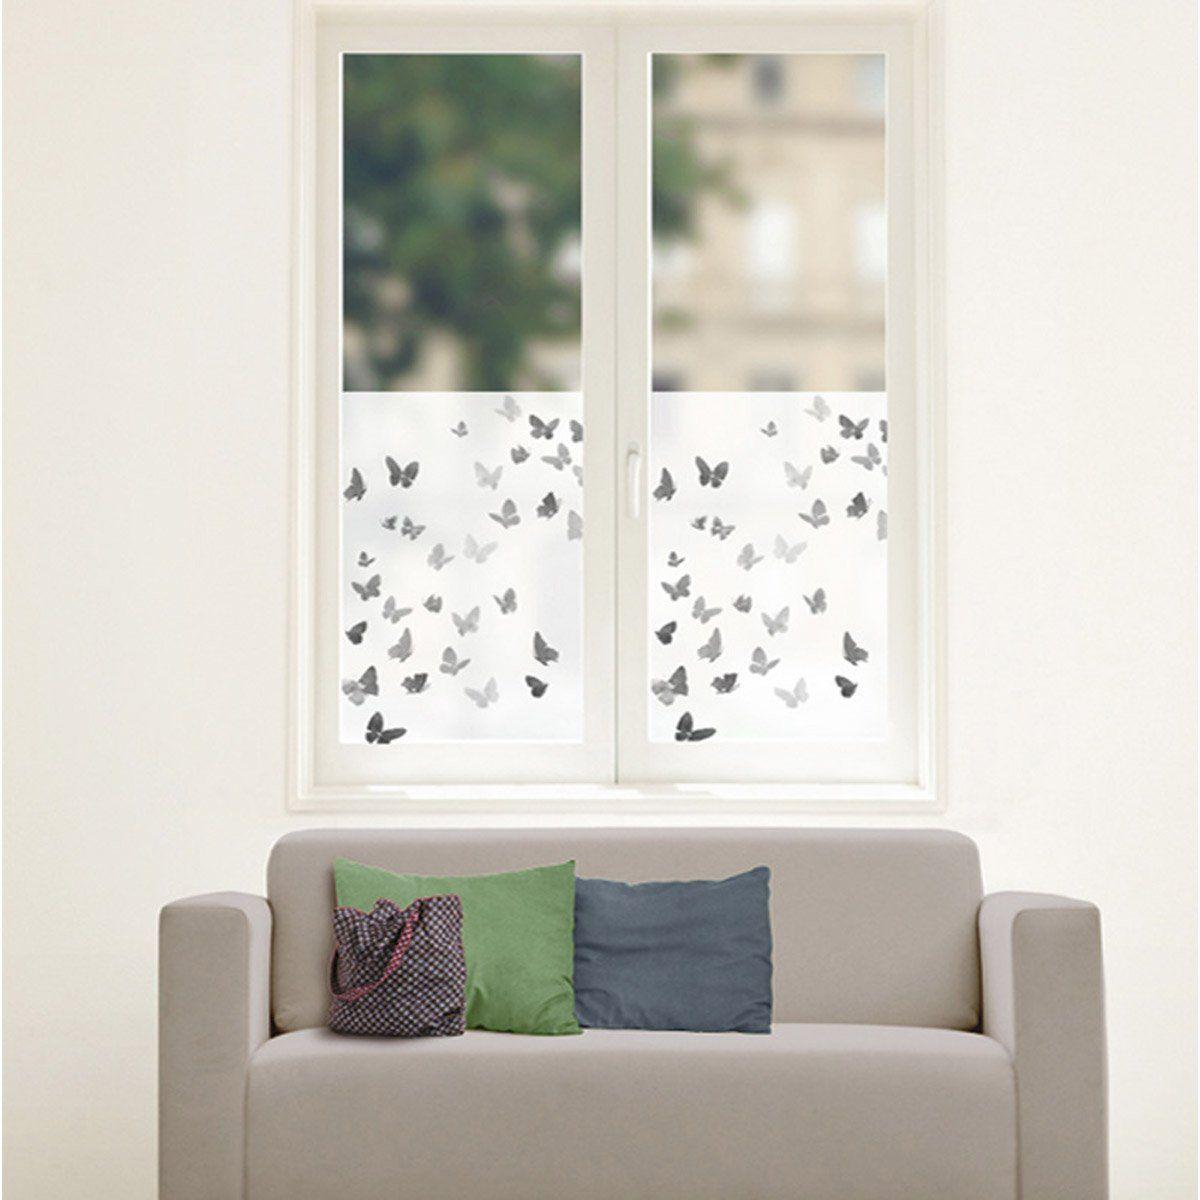 Sticker Papillons 50 Cm X 70 Cm Butterfly Wall Decals Window Film Designs Window Clings